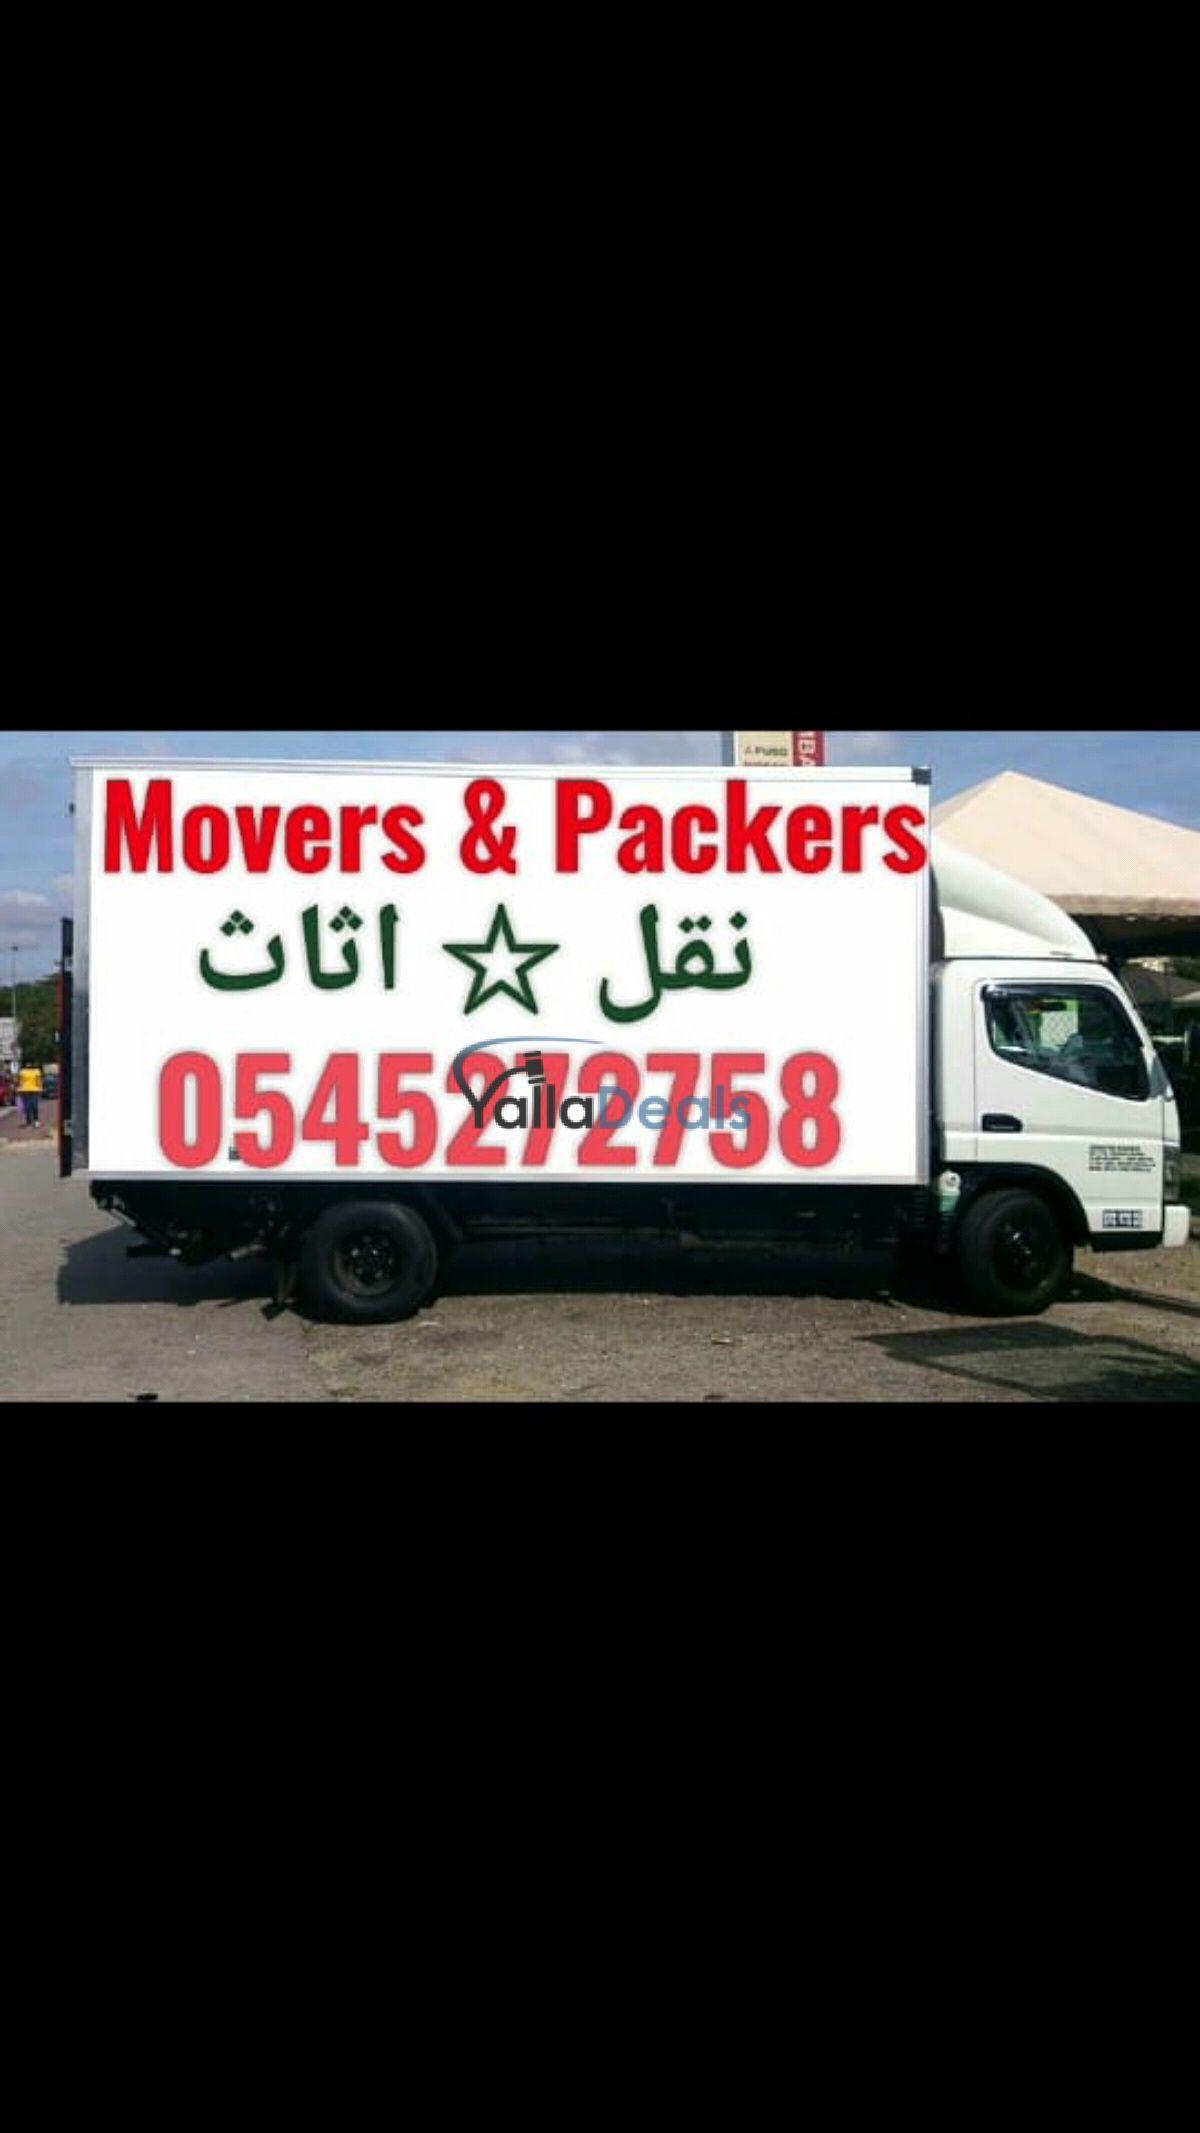 Chauffeur Service in Abu Shagara, Al Sharjah